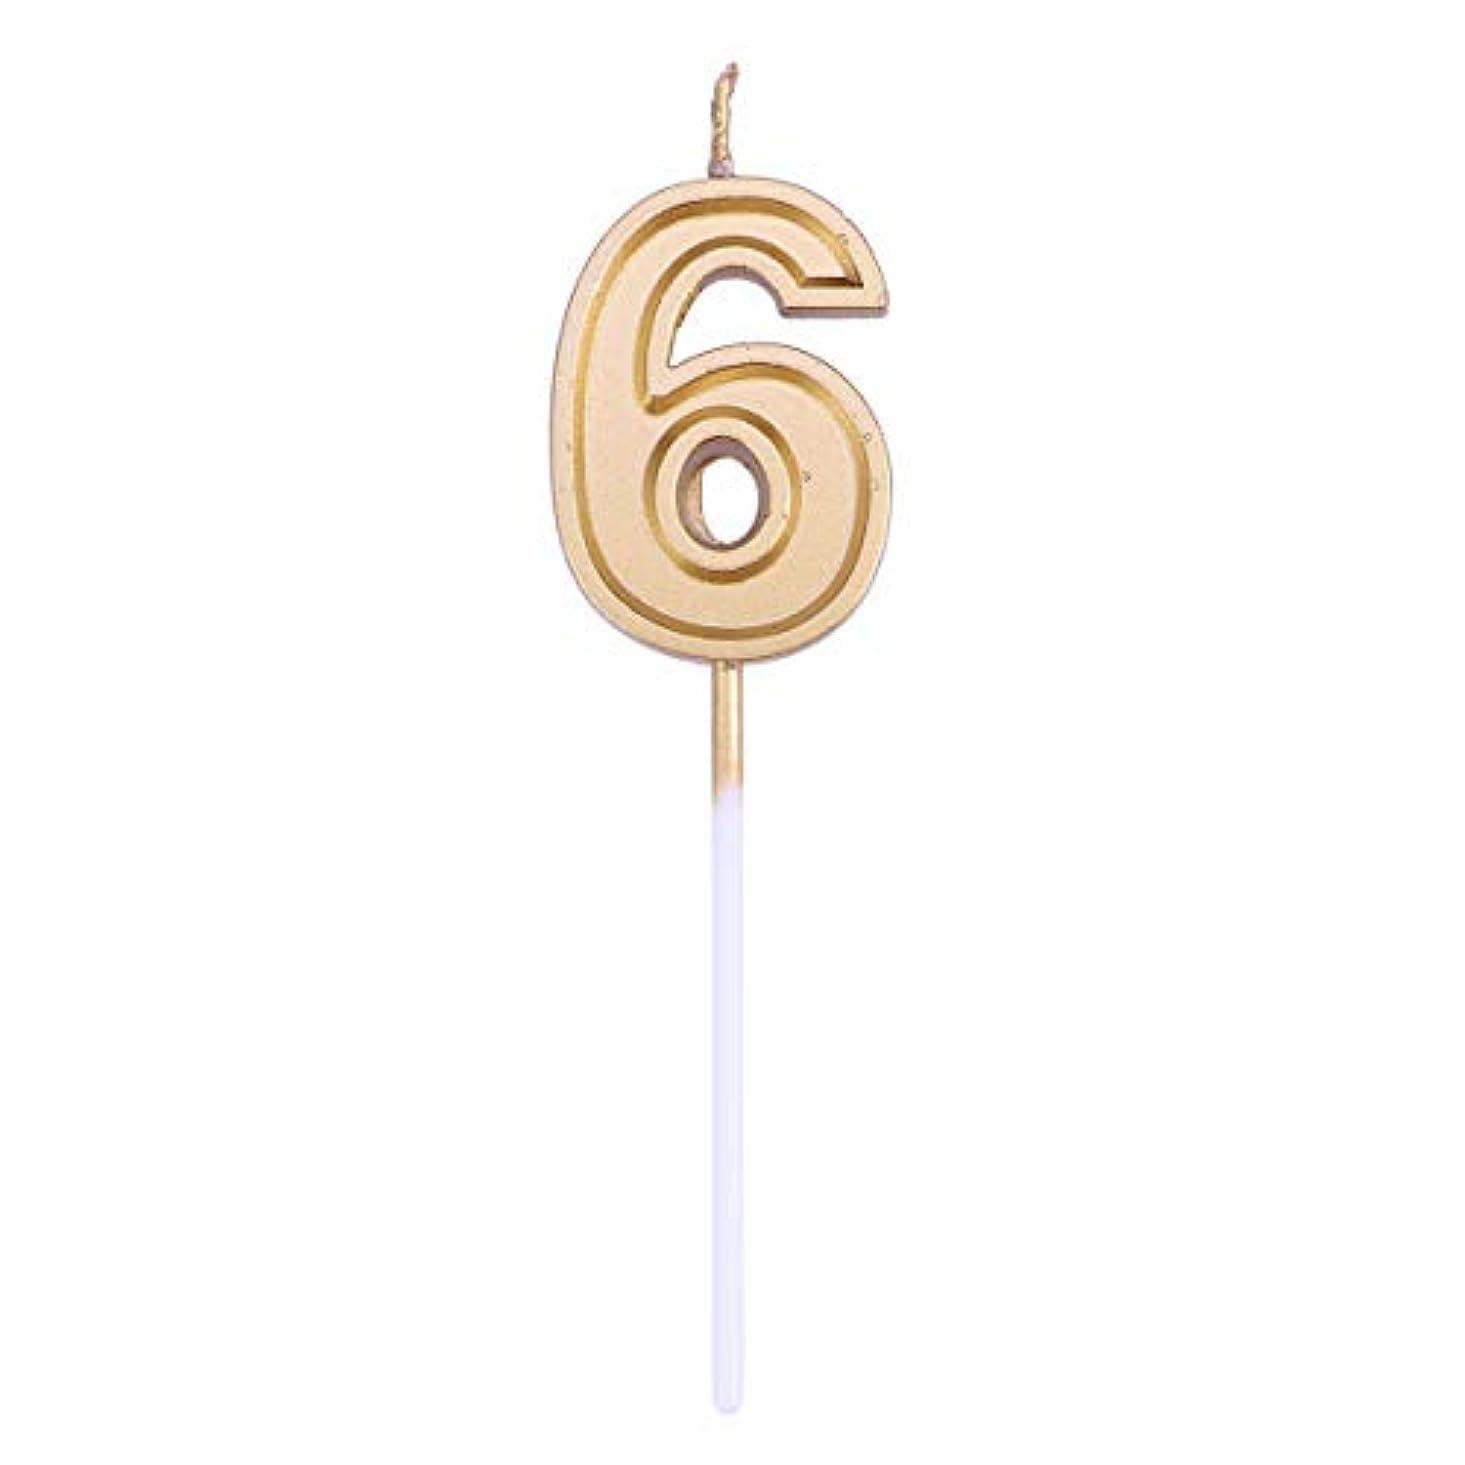 Toyvian ゴールドラメ誕生日おめでとう数字キャンドル番号キャンドルケーキトッパー装飾用大人キッズパーティー(番号6)